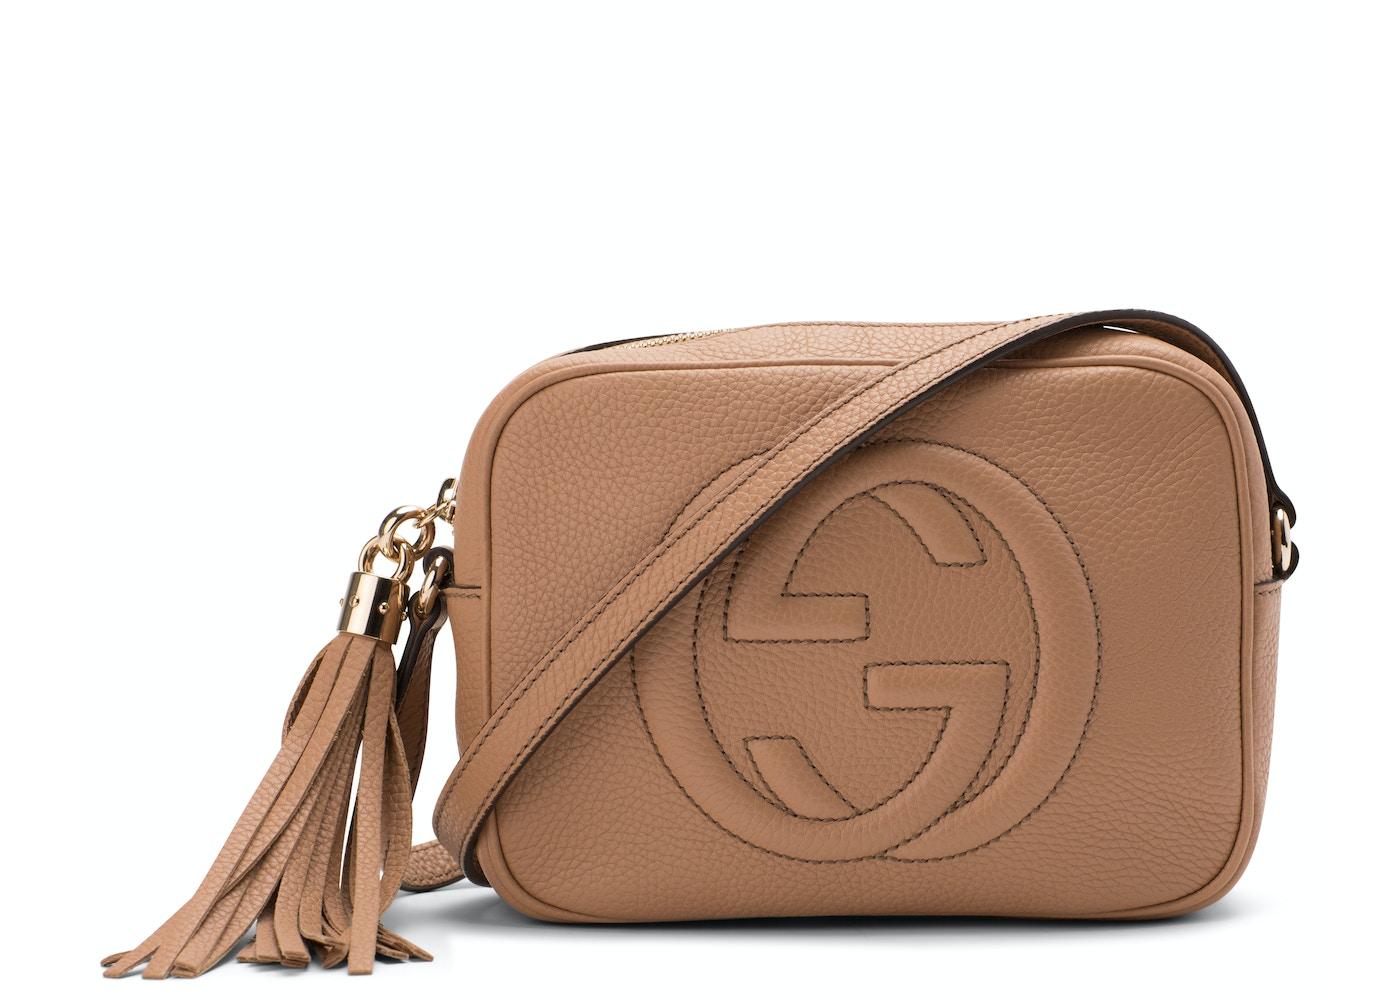 b9dc4f951 Buy & Sell Gucci Luxury Handbags